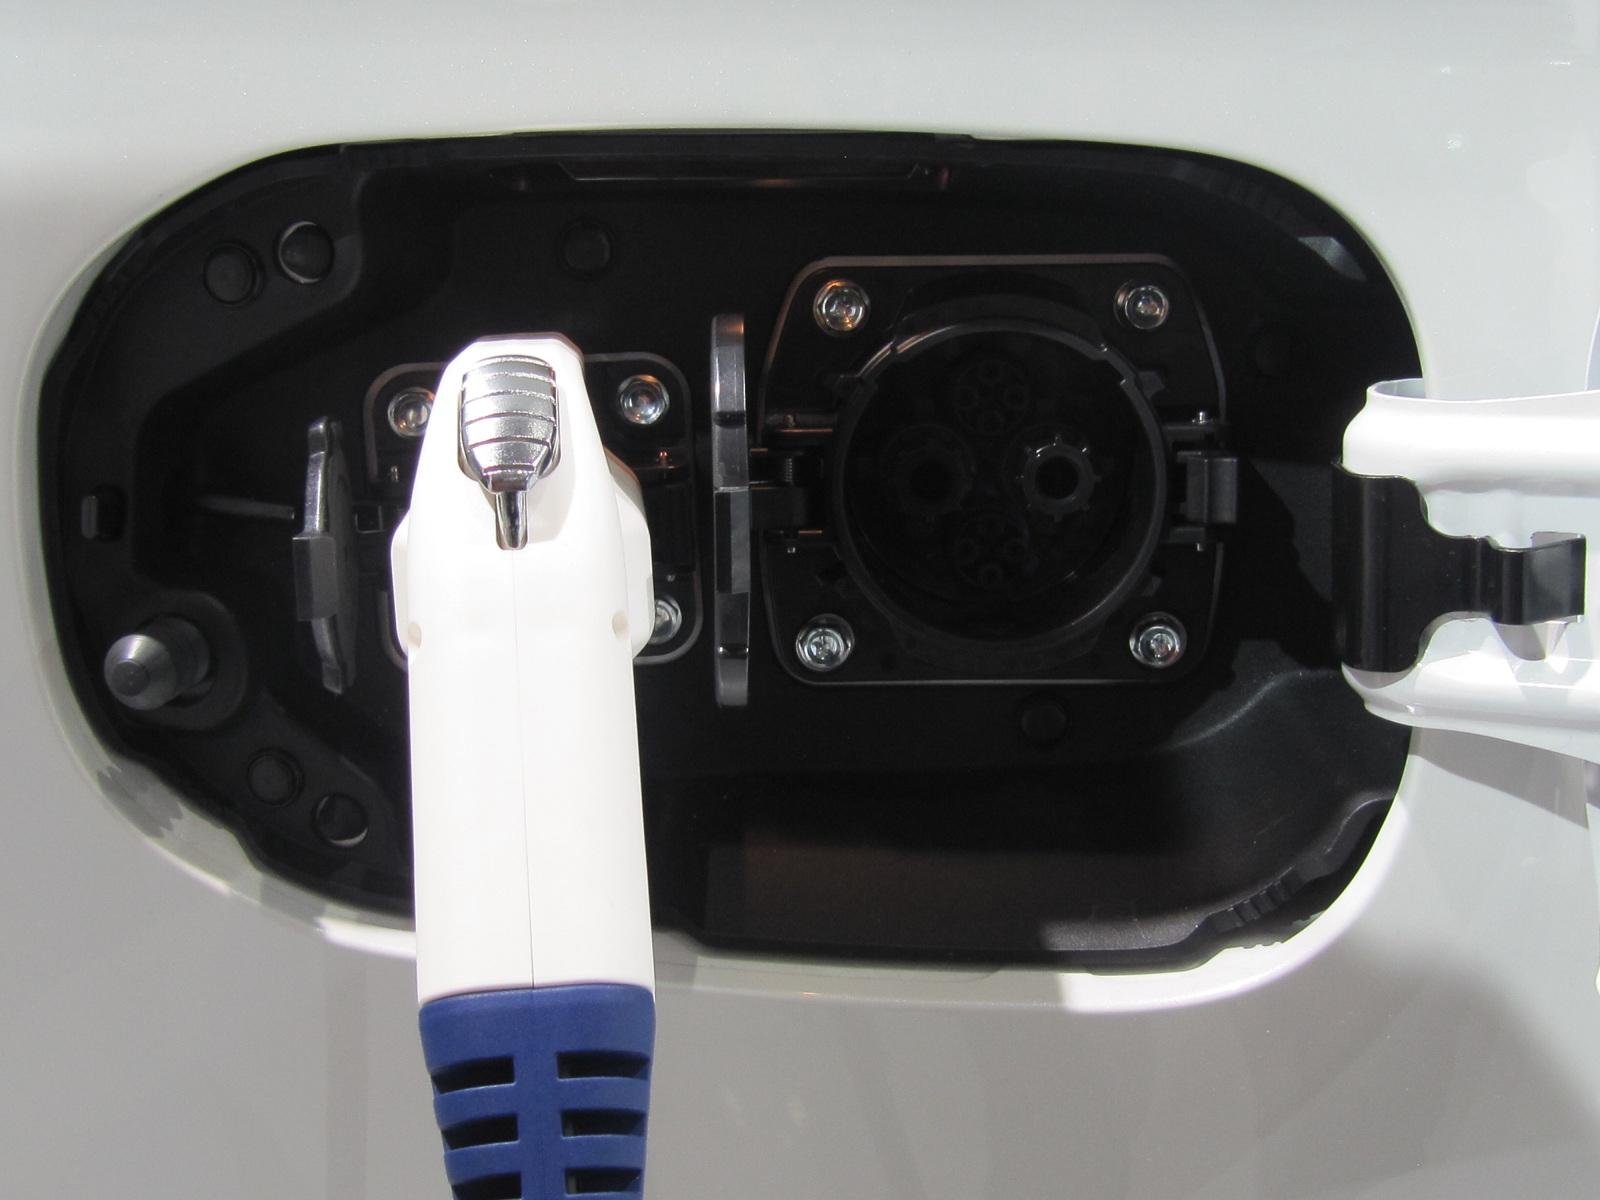 2017 Mitsubishi Plug-In Hybrid To Lose Quick-Charging Port ...